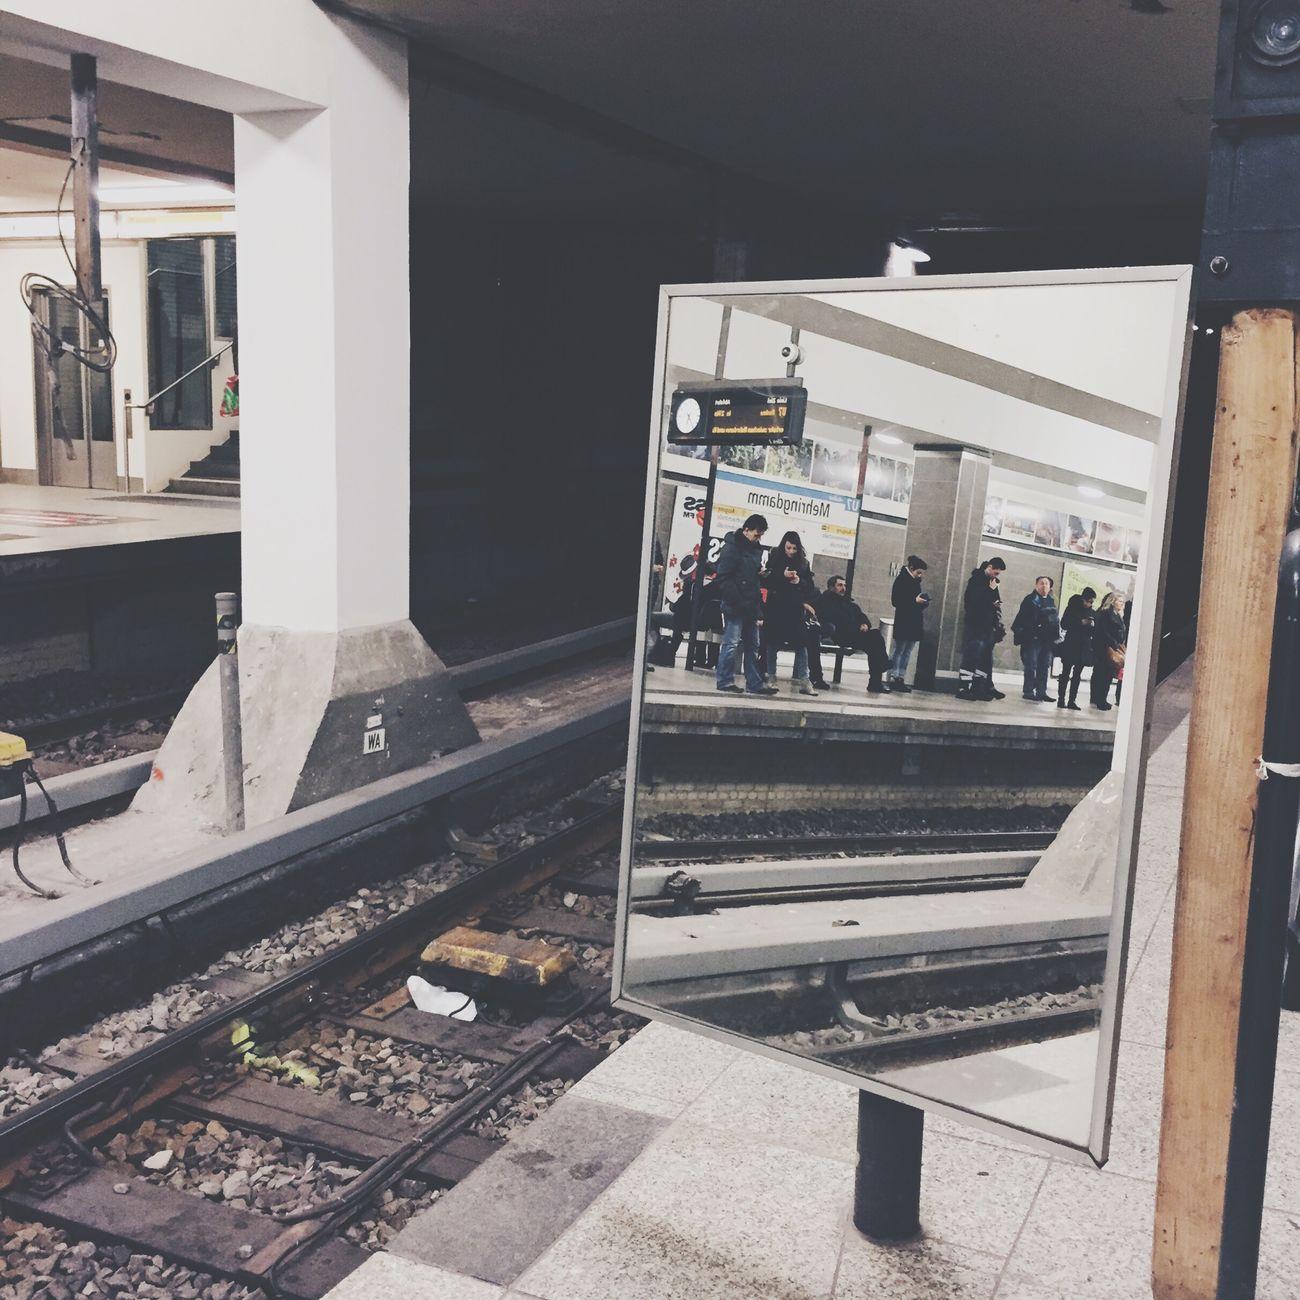 Berlin Ubahn Ubahn Berlin Spiegelung